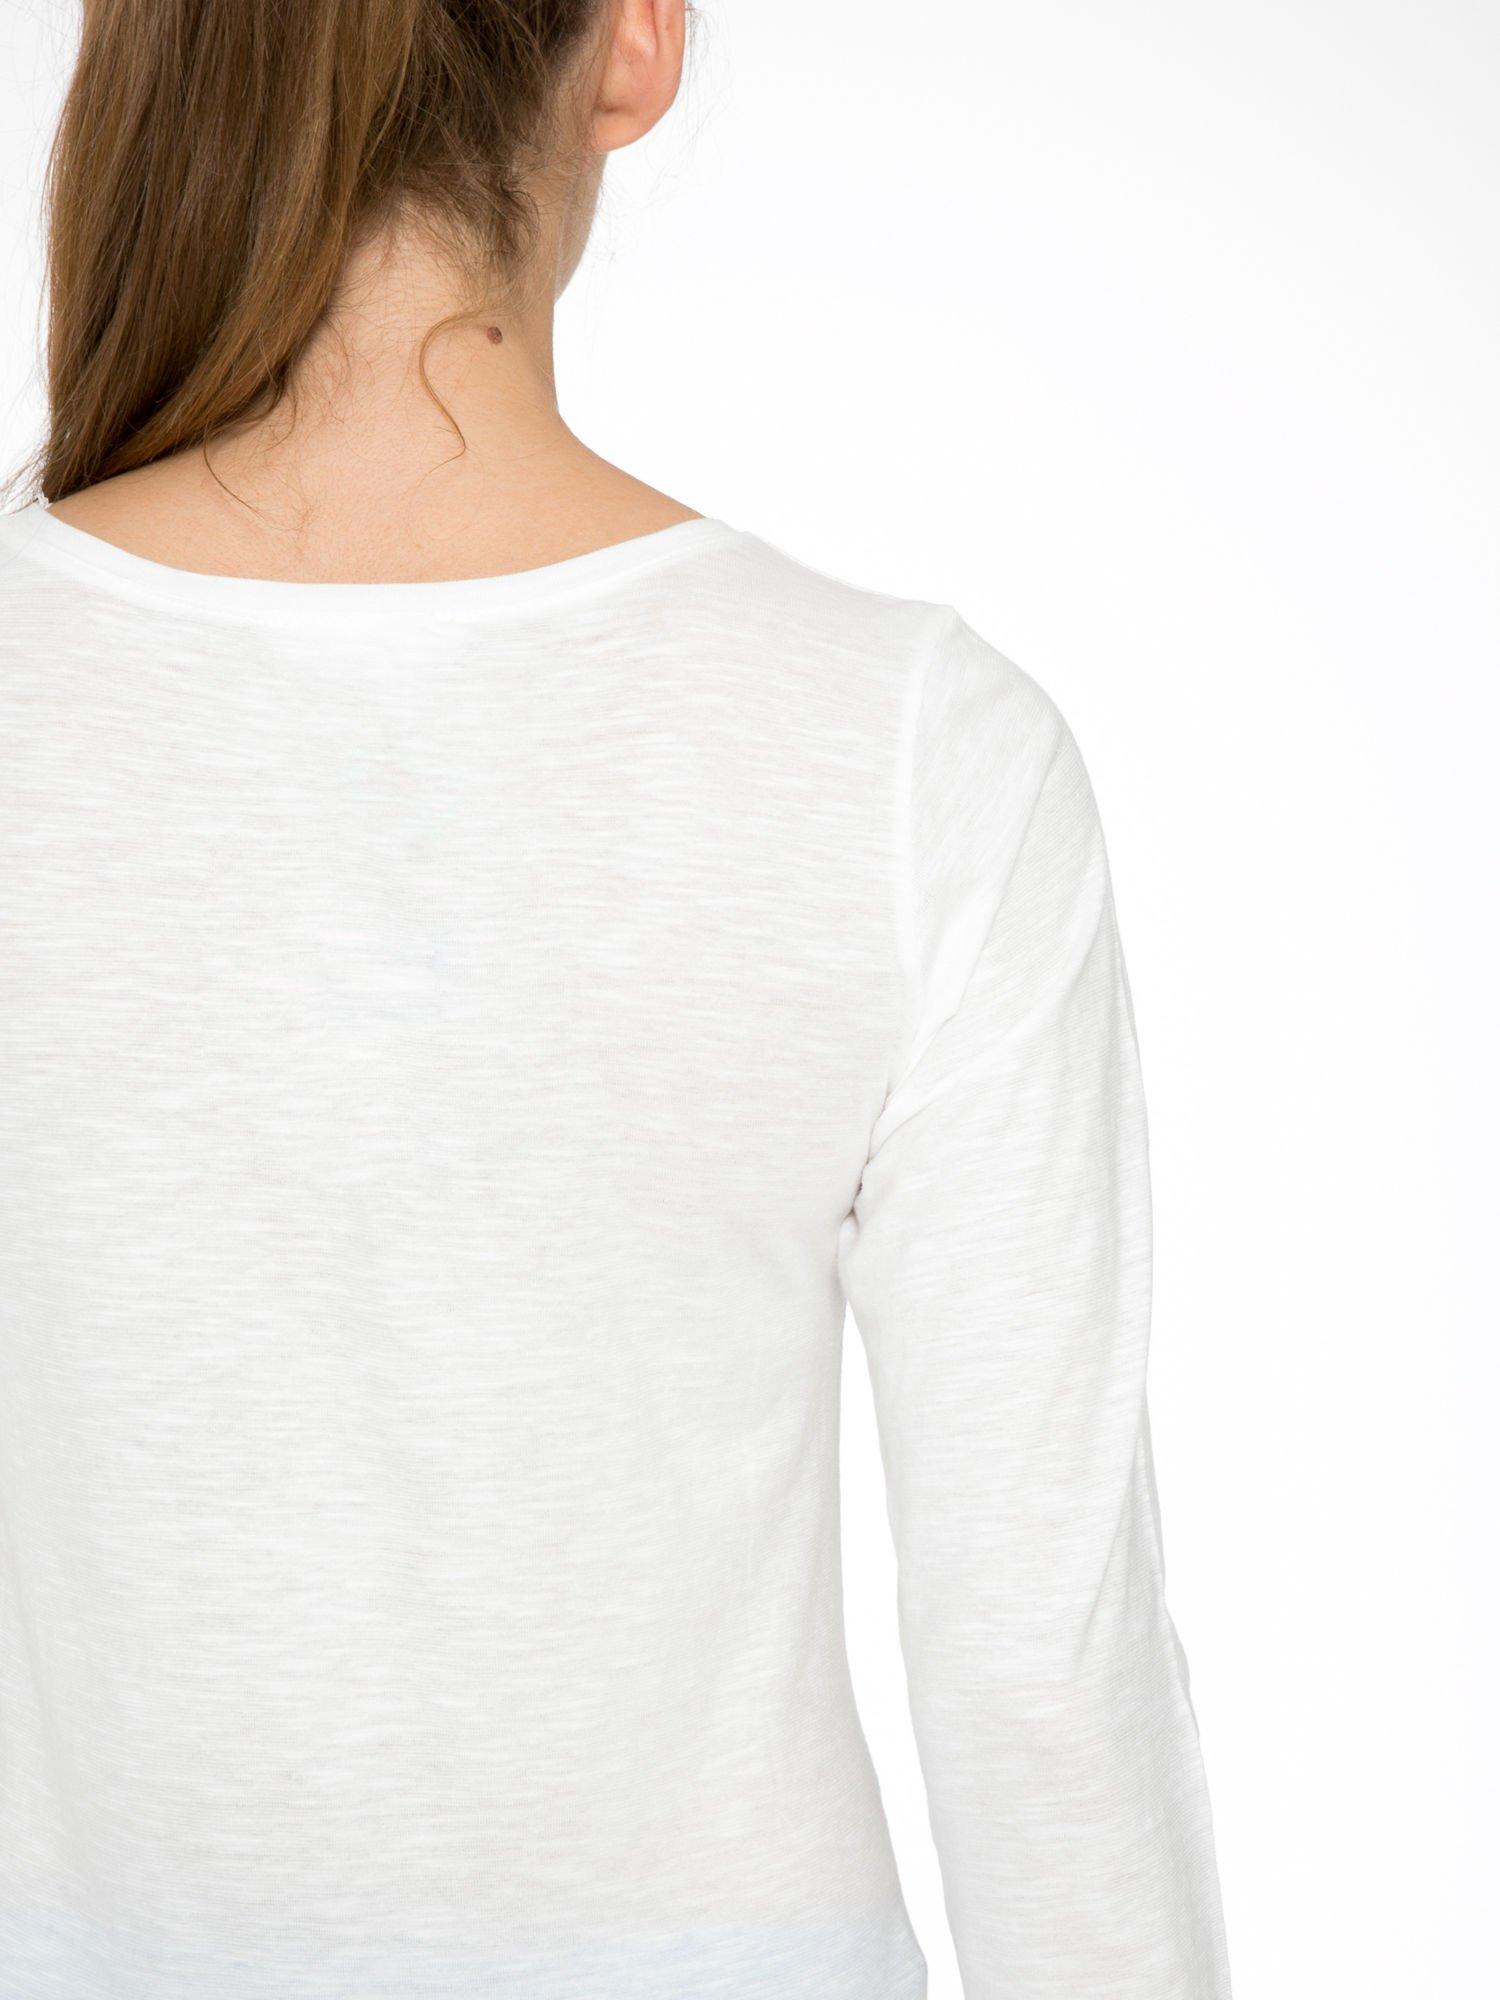 Ecru bluzka z nadrukiem pudli i napisem LOOK AFTER YOUR FRIENDS                                  zdj.                                  10